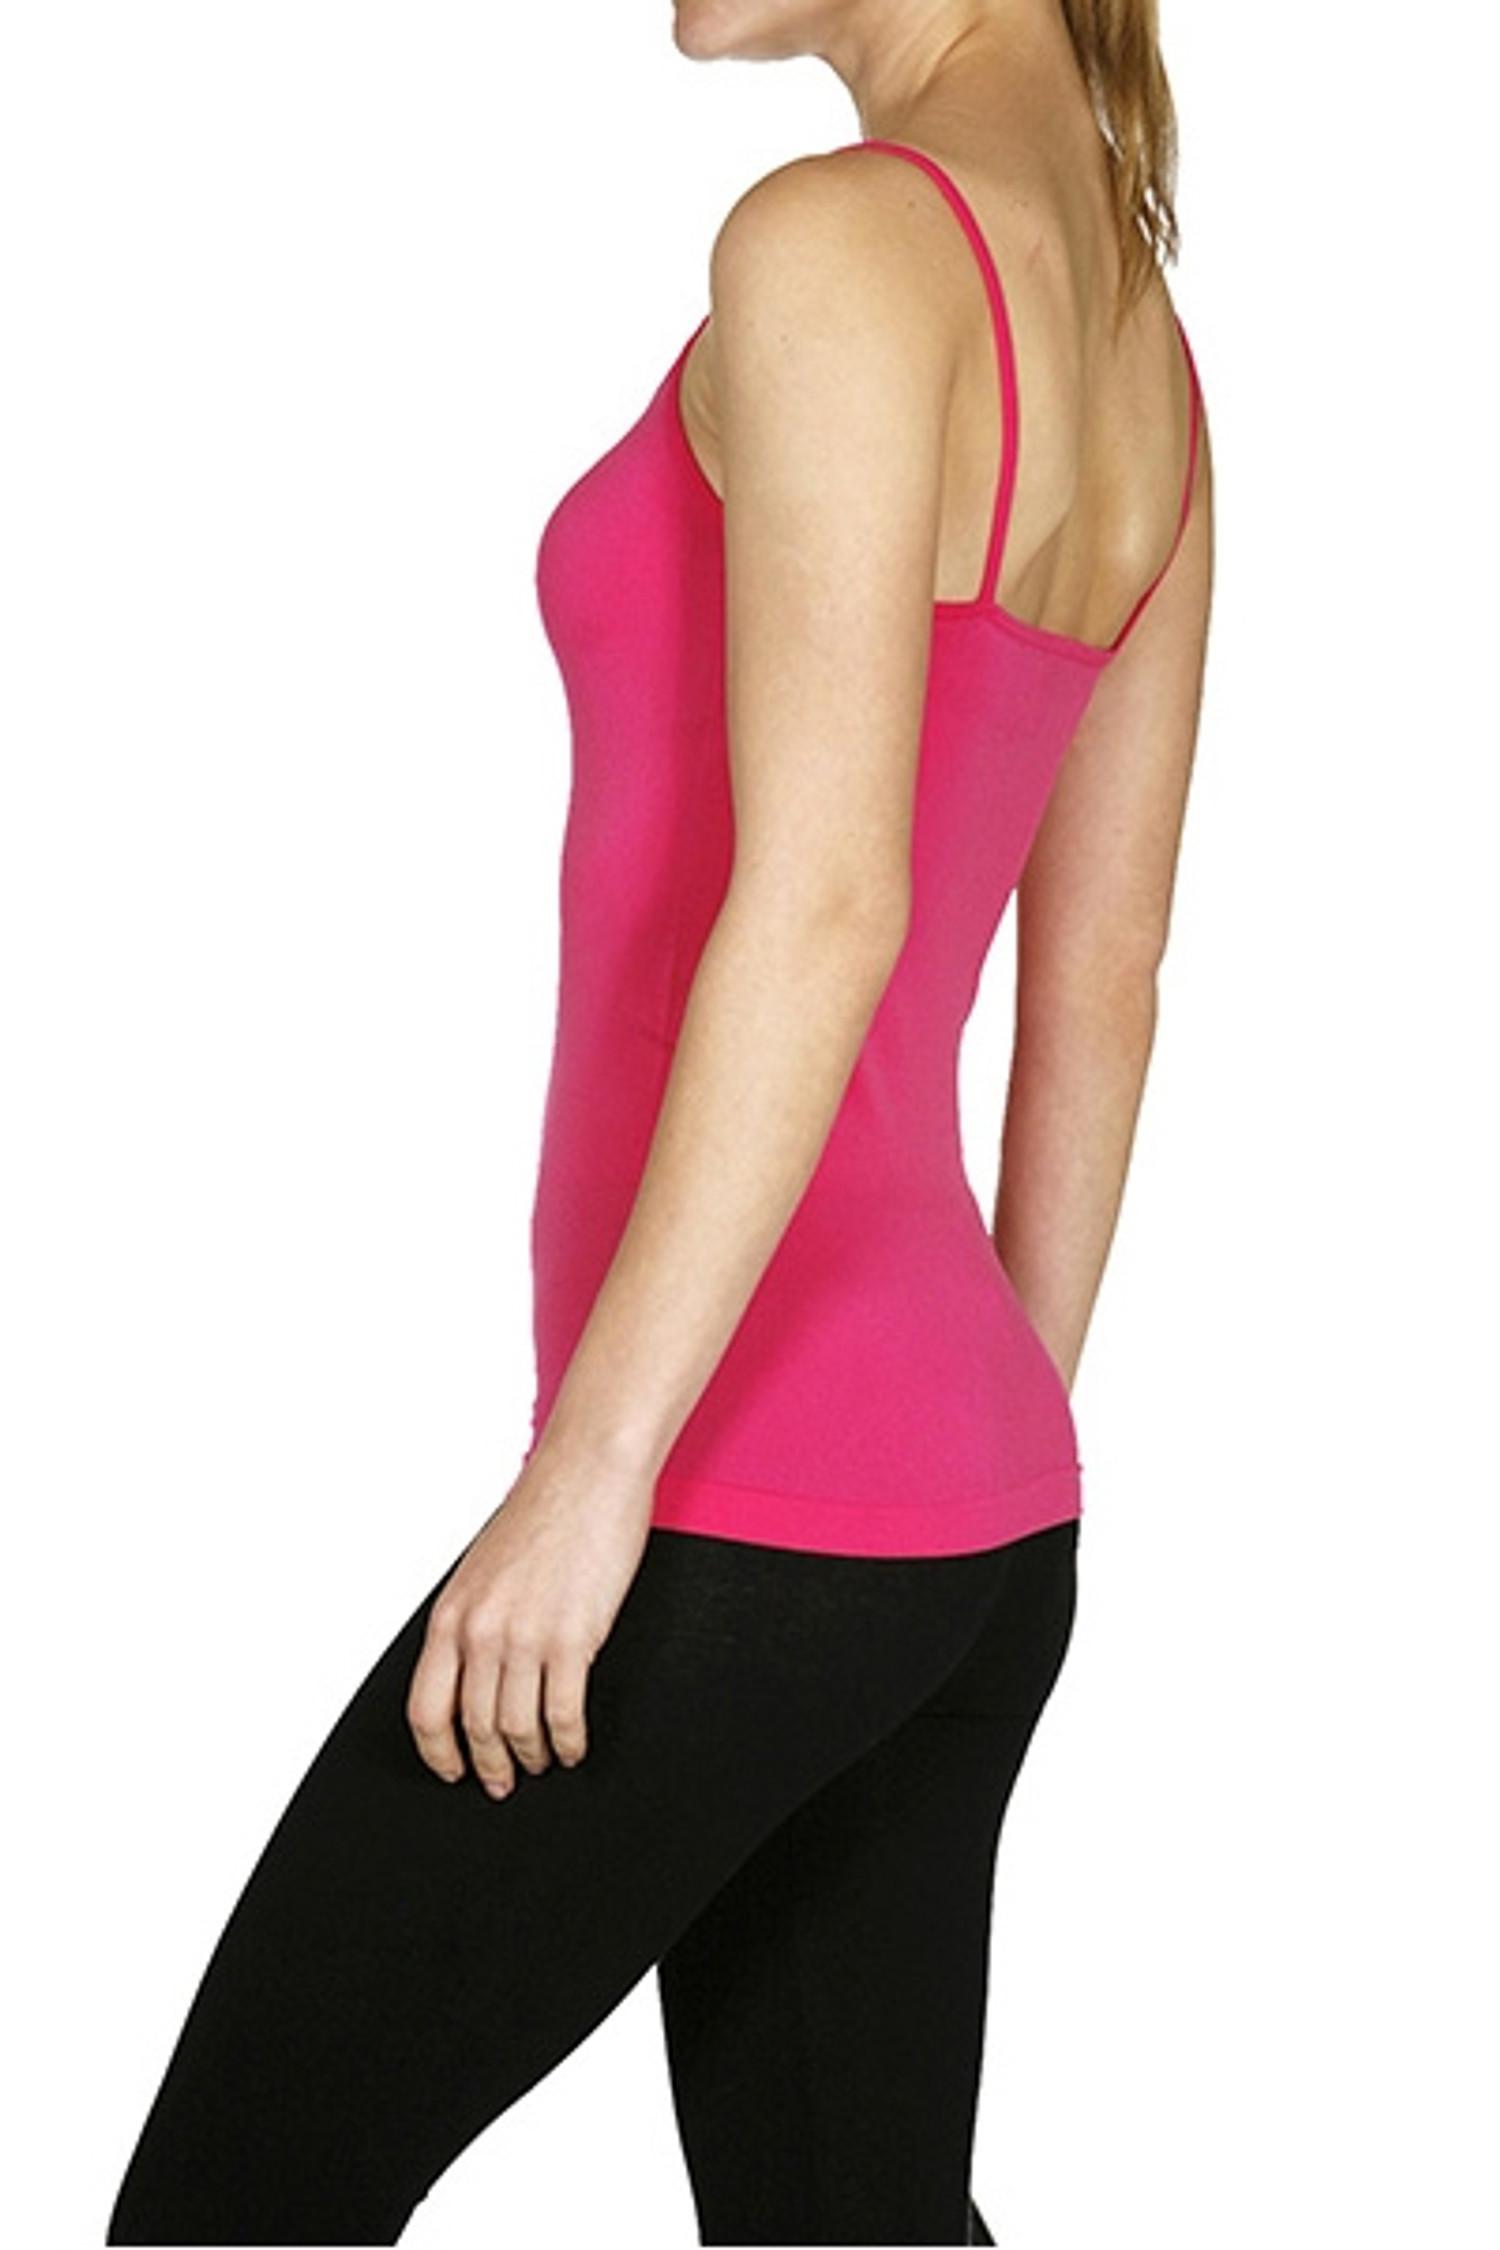 Plus Size Nylon Spandex Camisole